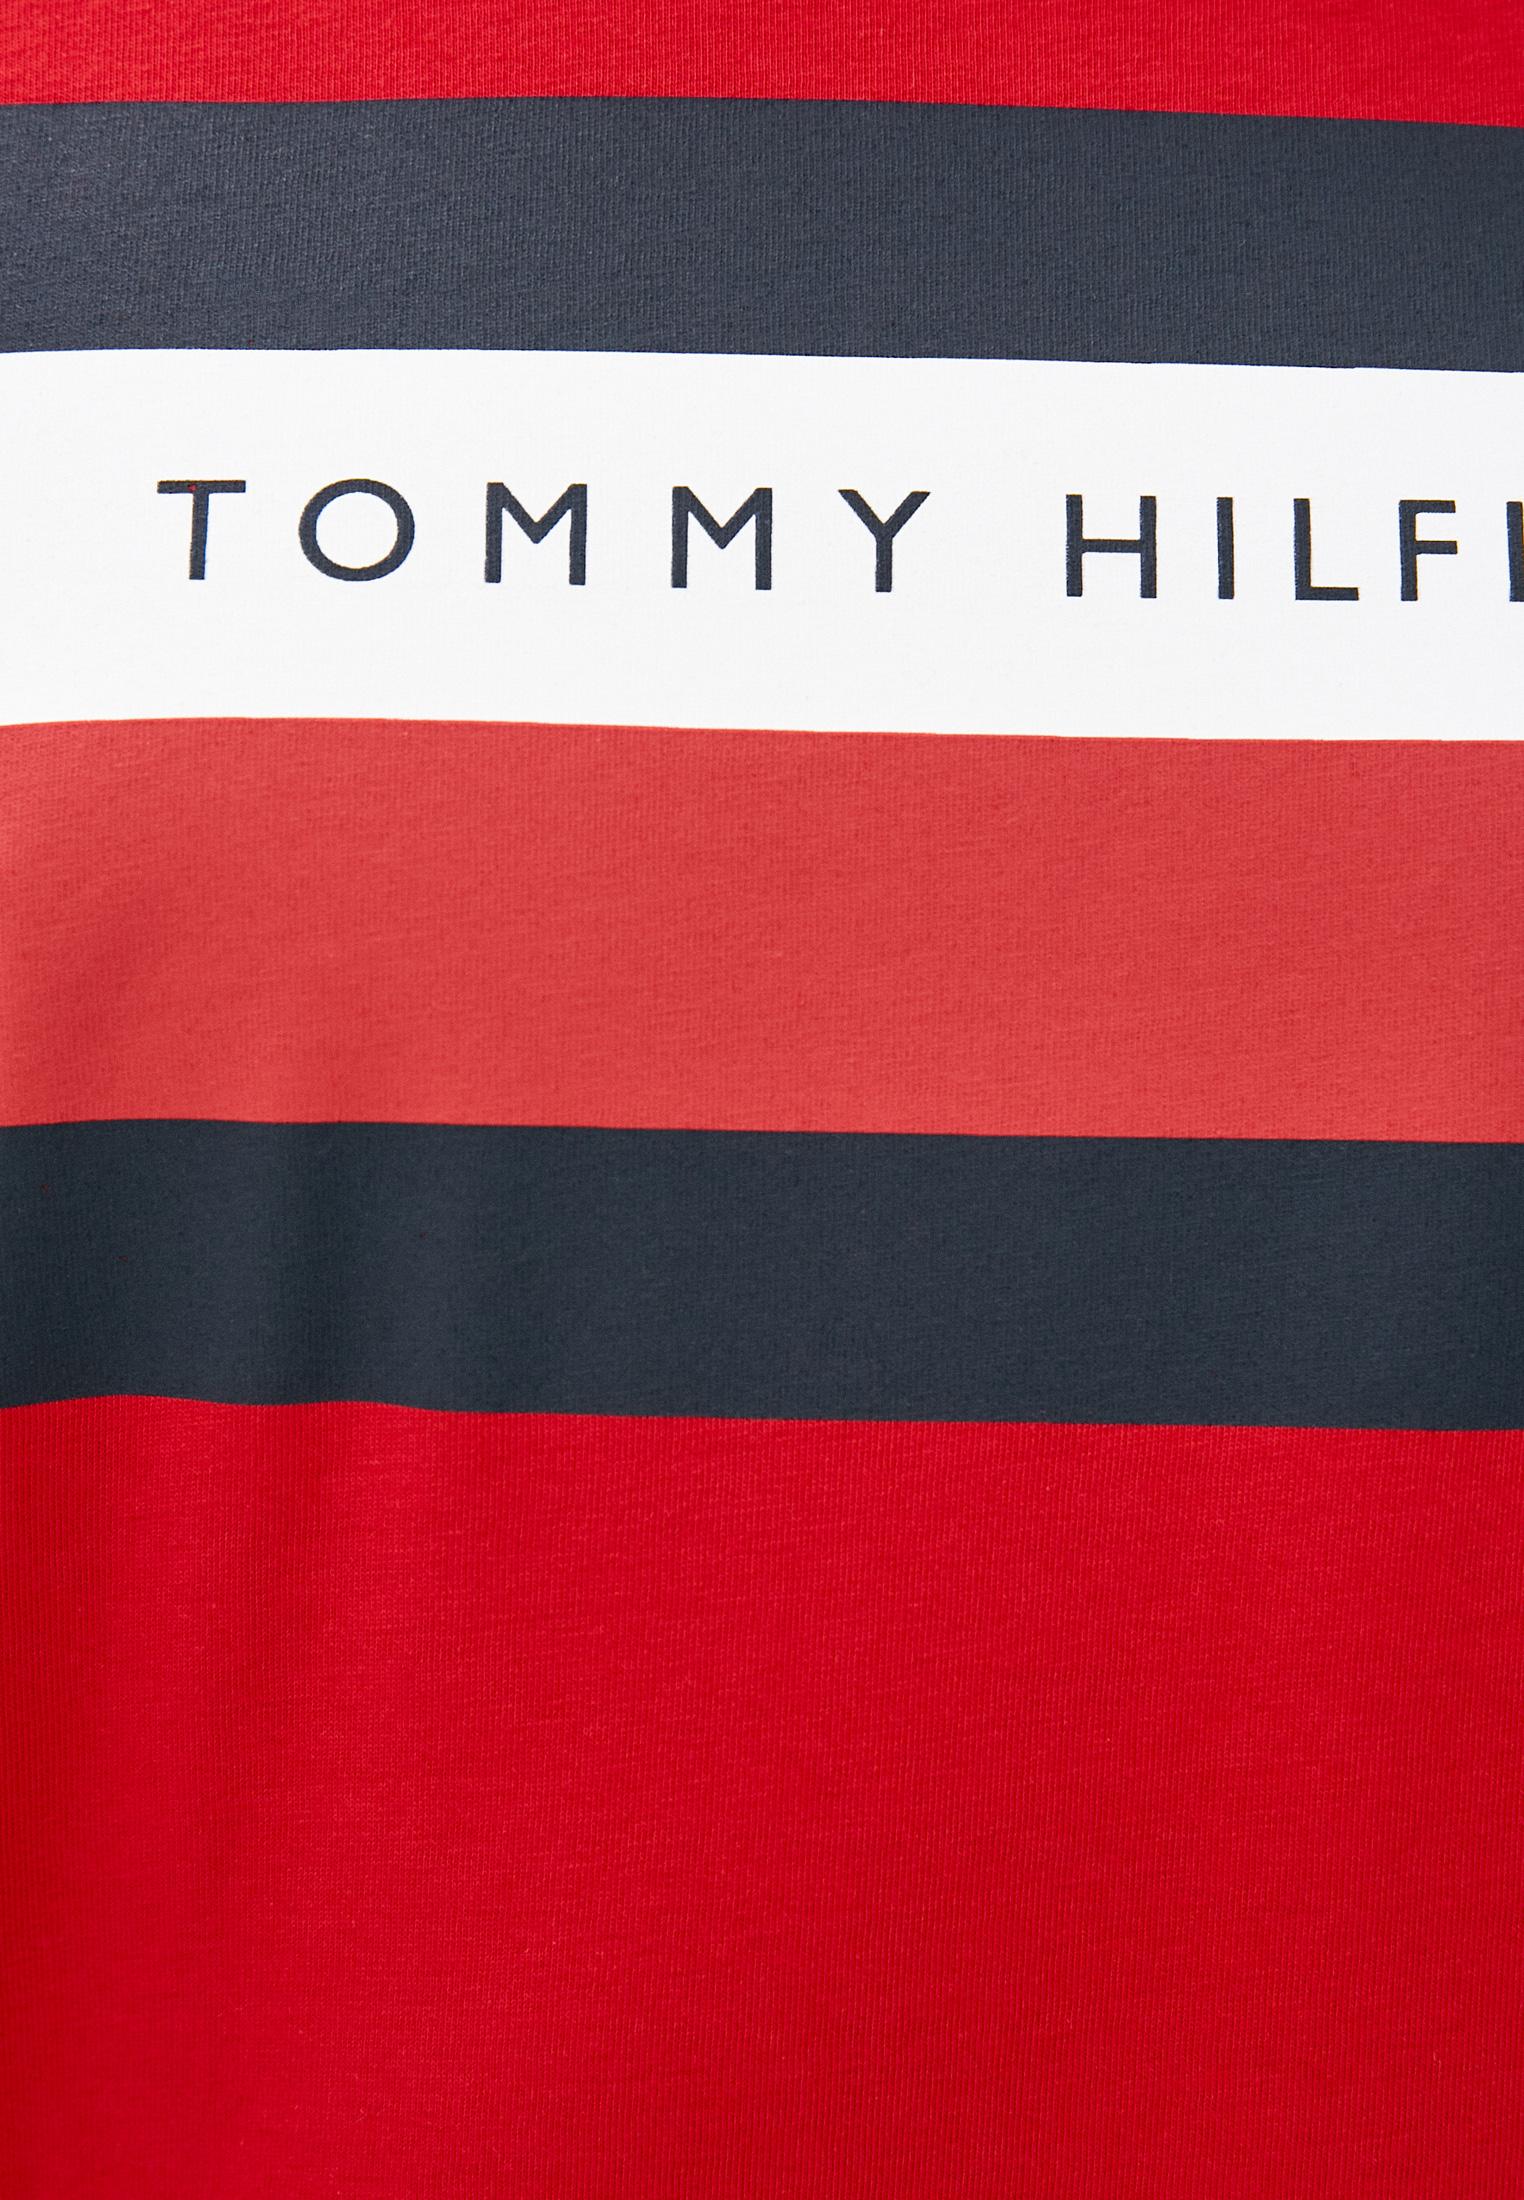 Футболка с коротким рукавом Tommy Hilfiger (Томми Хилфигер) MW0MW15318: изображение 3